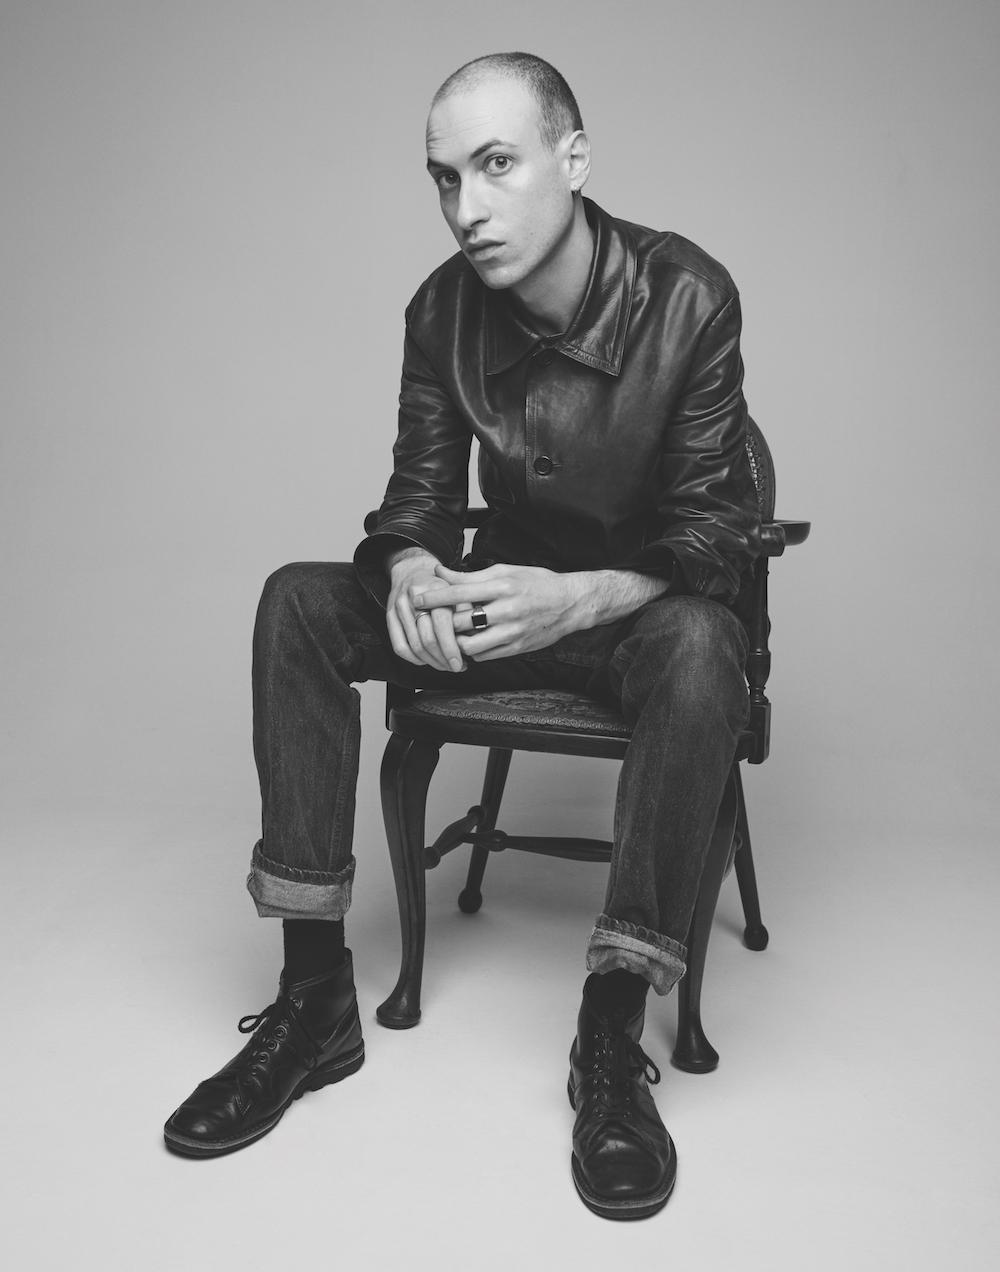 Photography Matt Holyoak